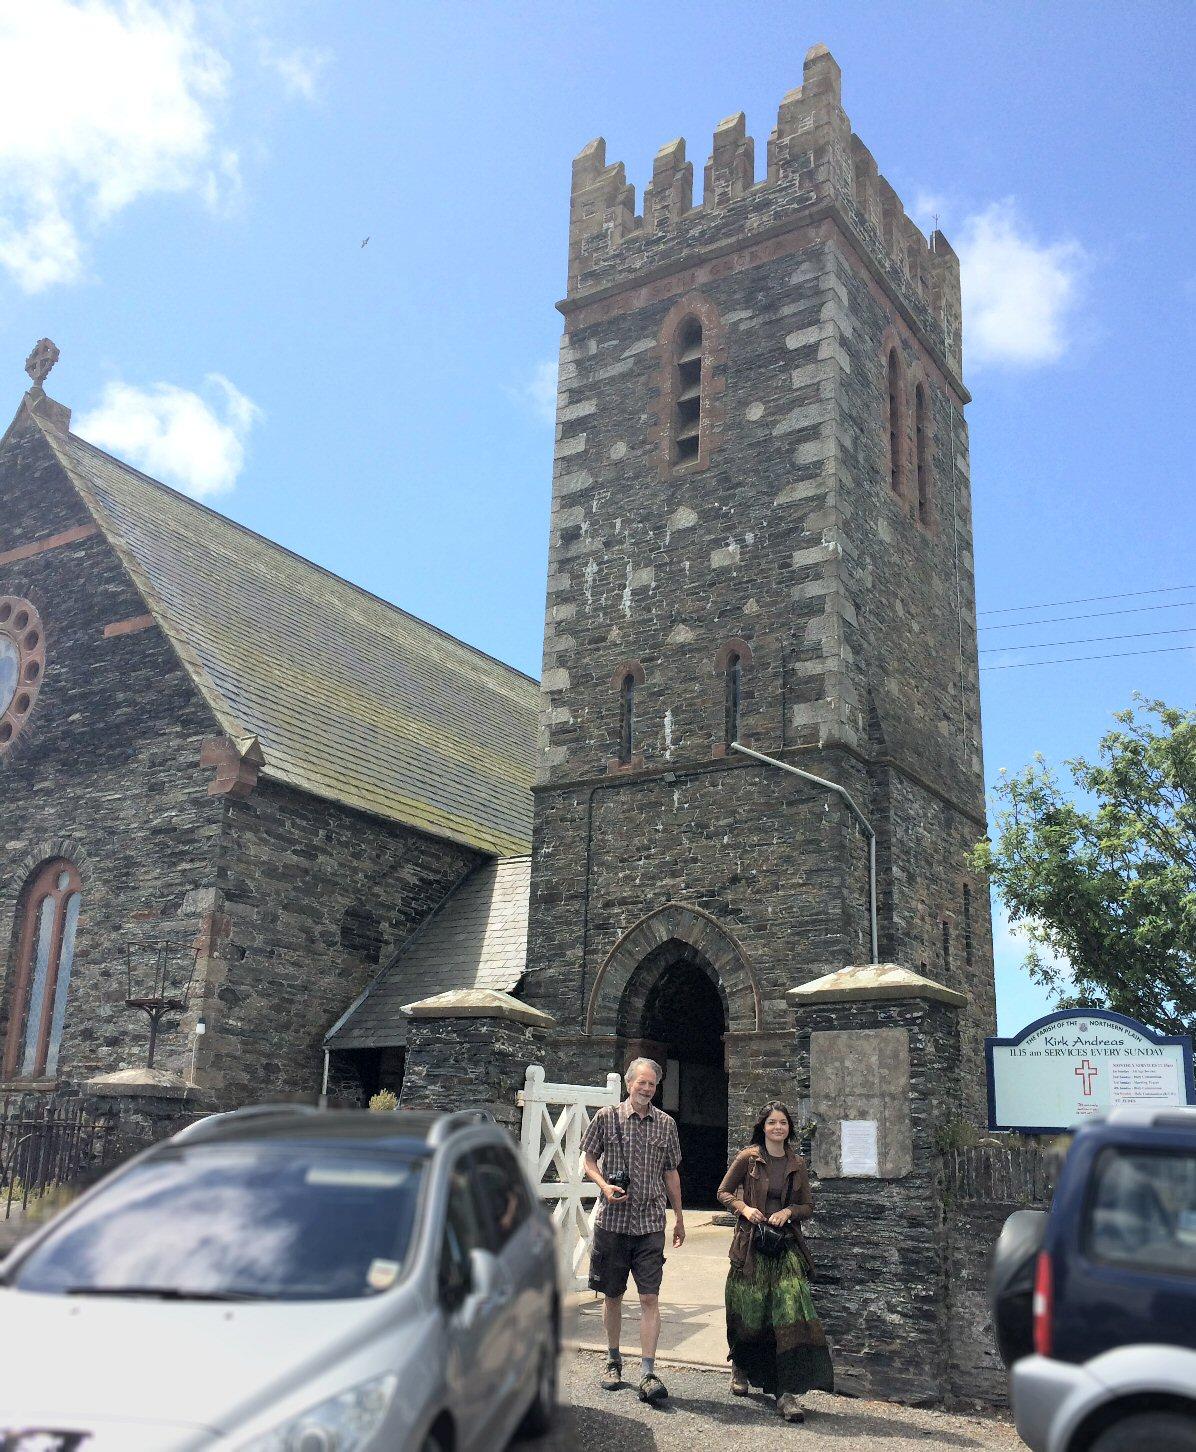 Exterior of Kirk Andreas, Isle of Man